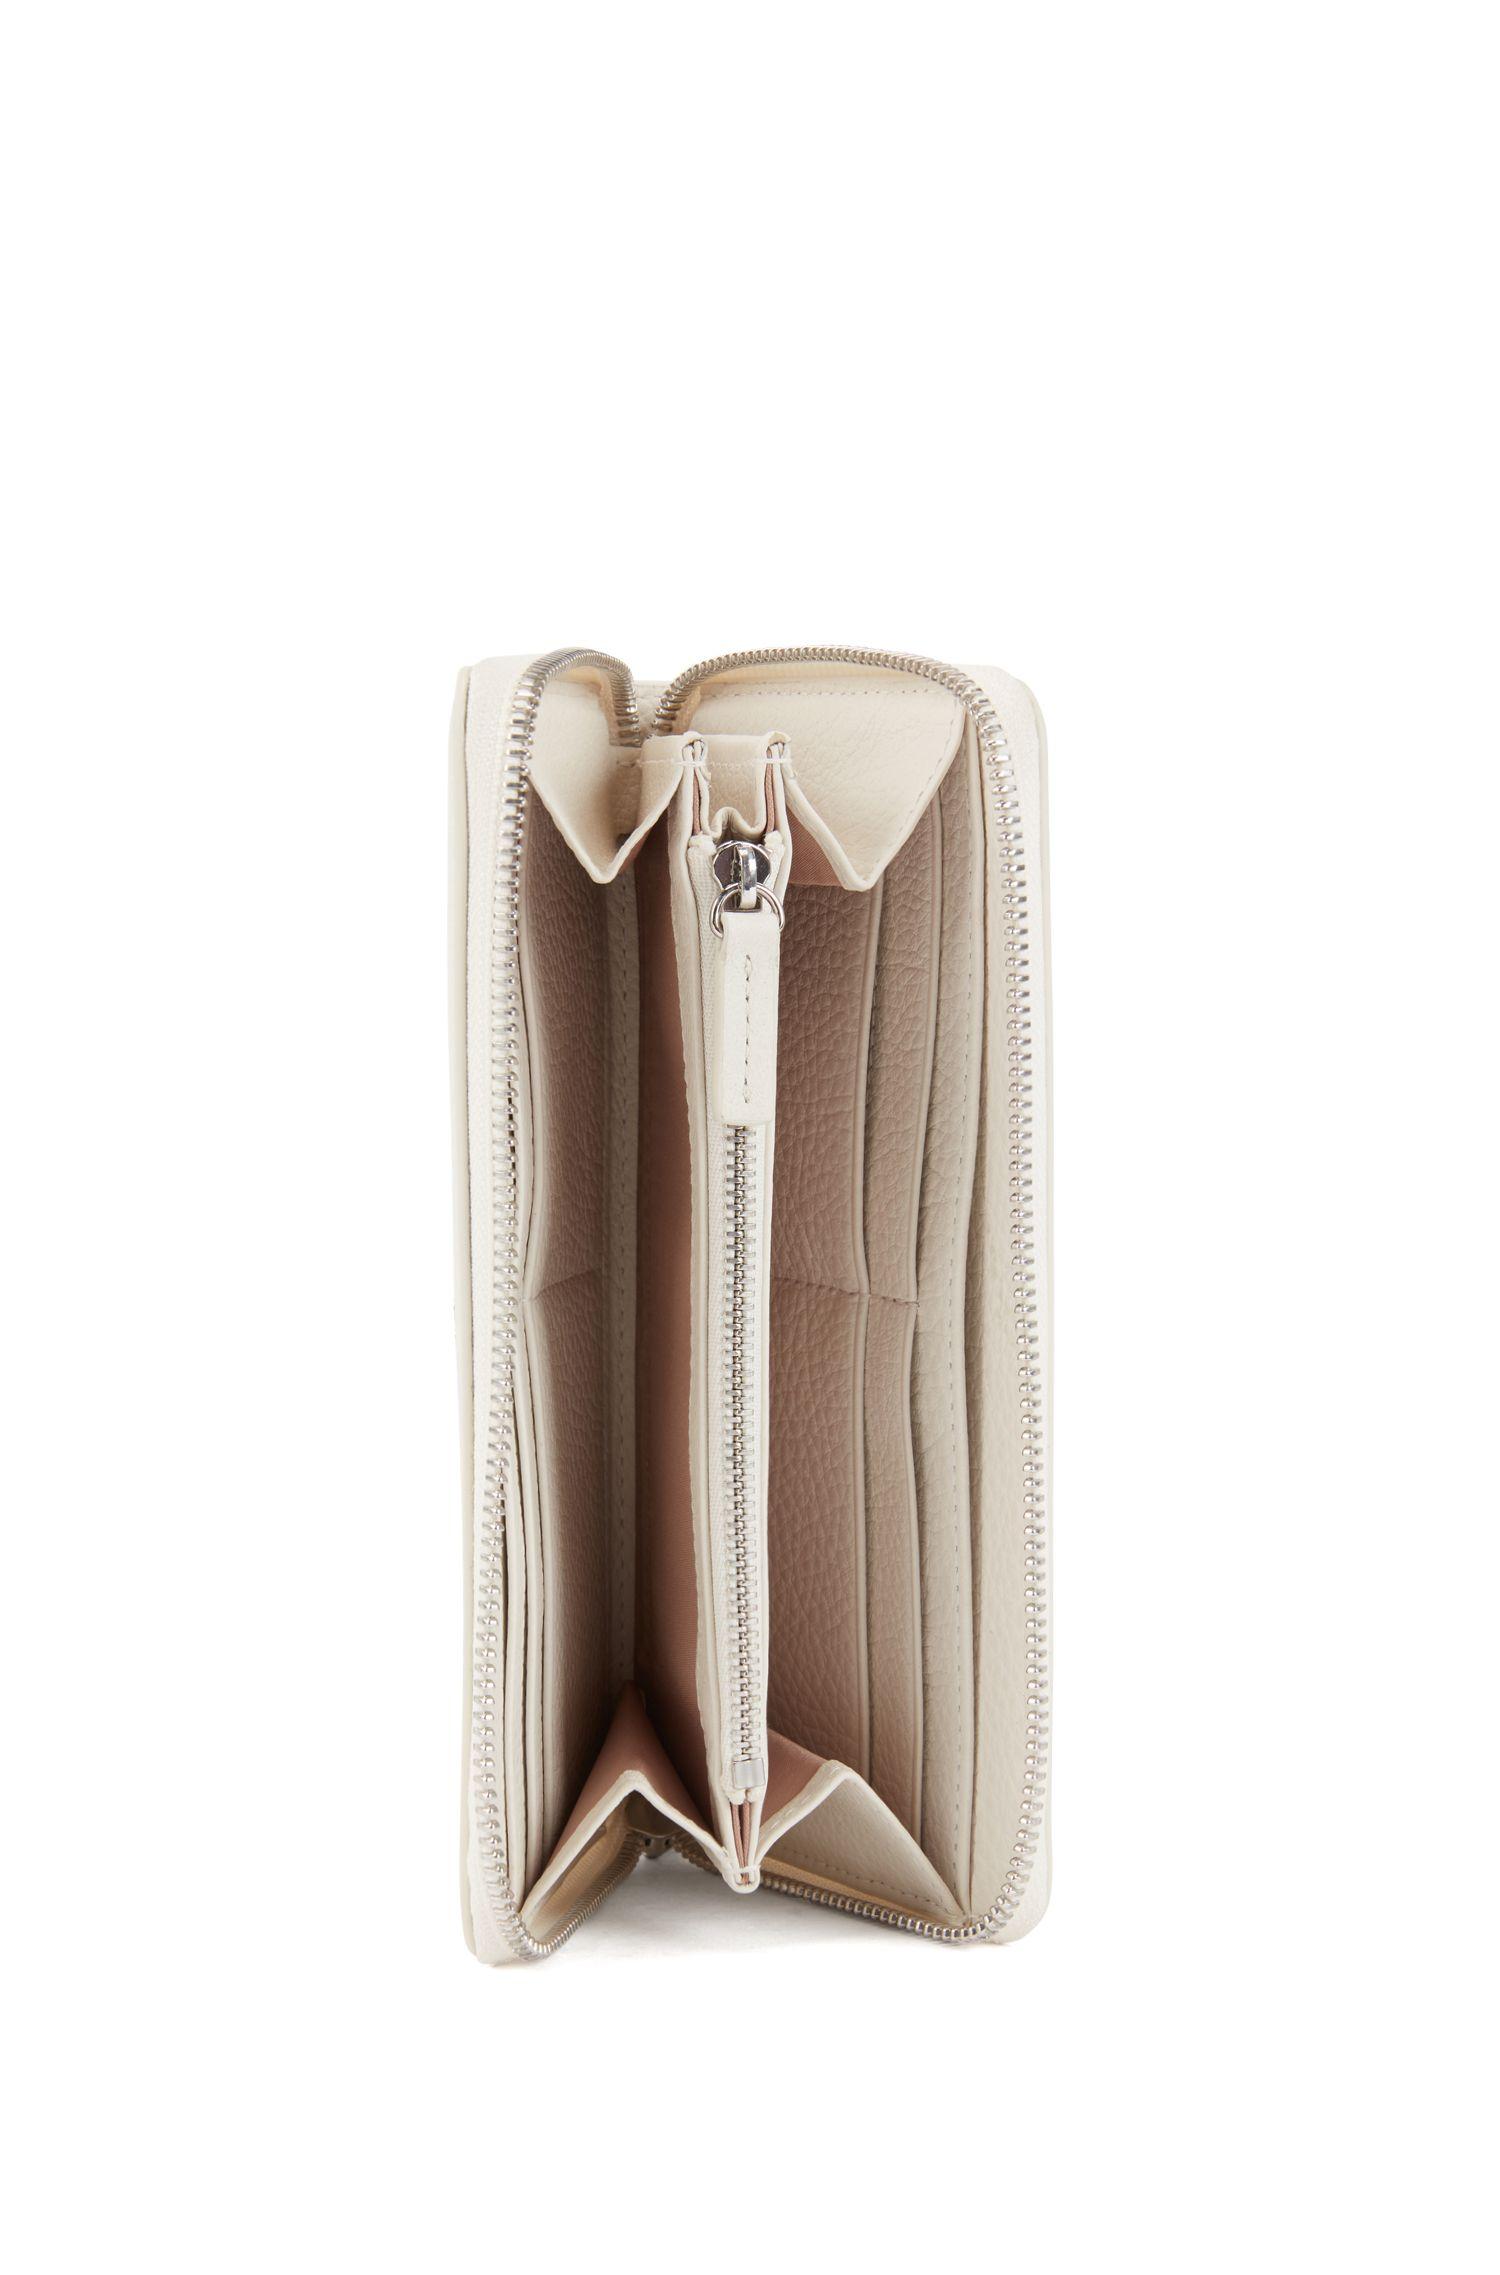 Zip-around wallet in grainy Italian leather, White